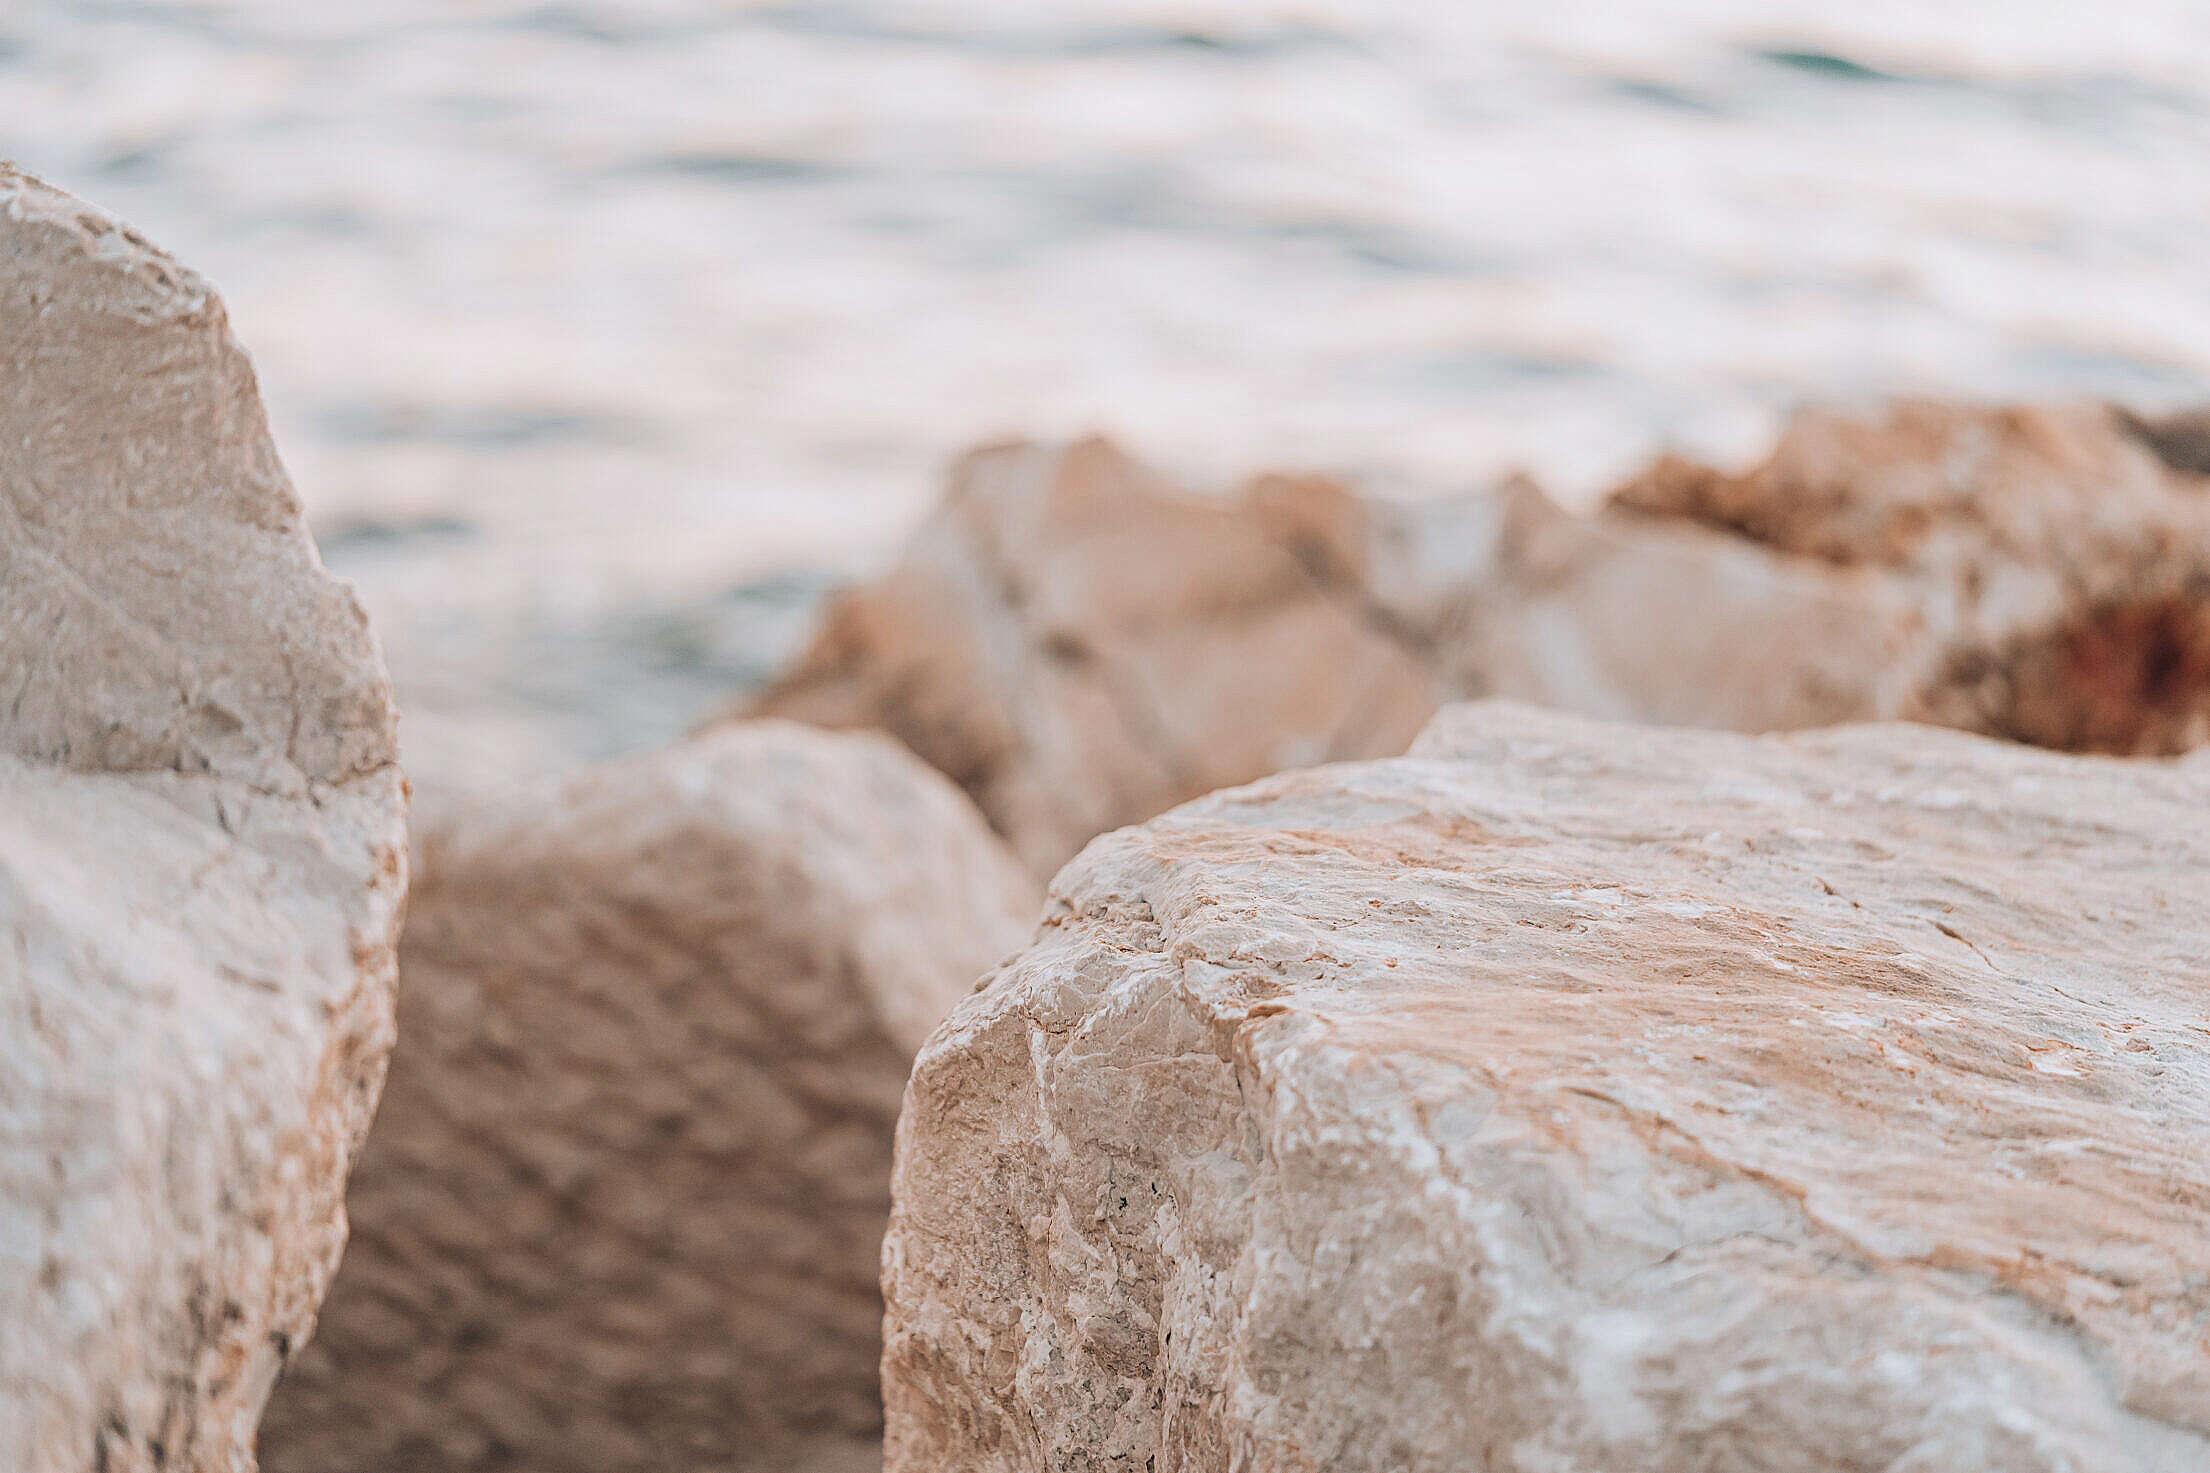 Rocky Shore by The Sea in Croatia Free Stock Photo